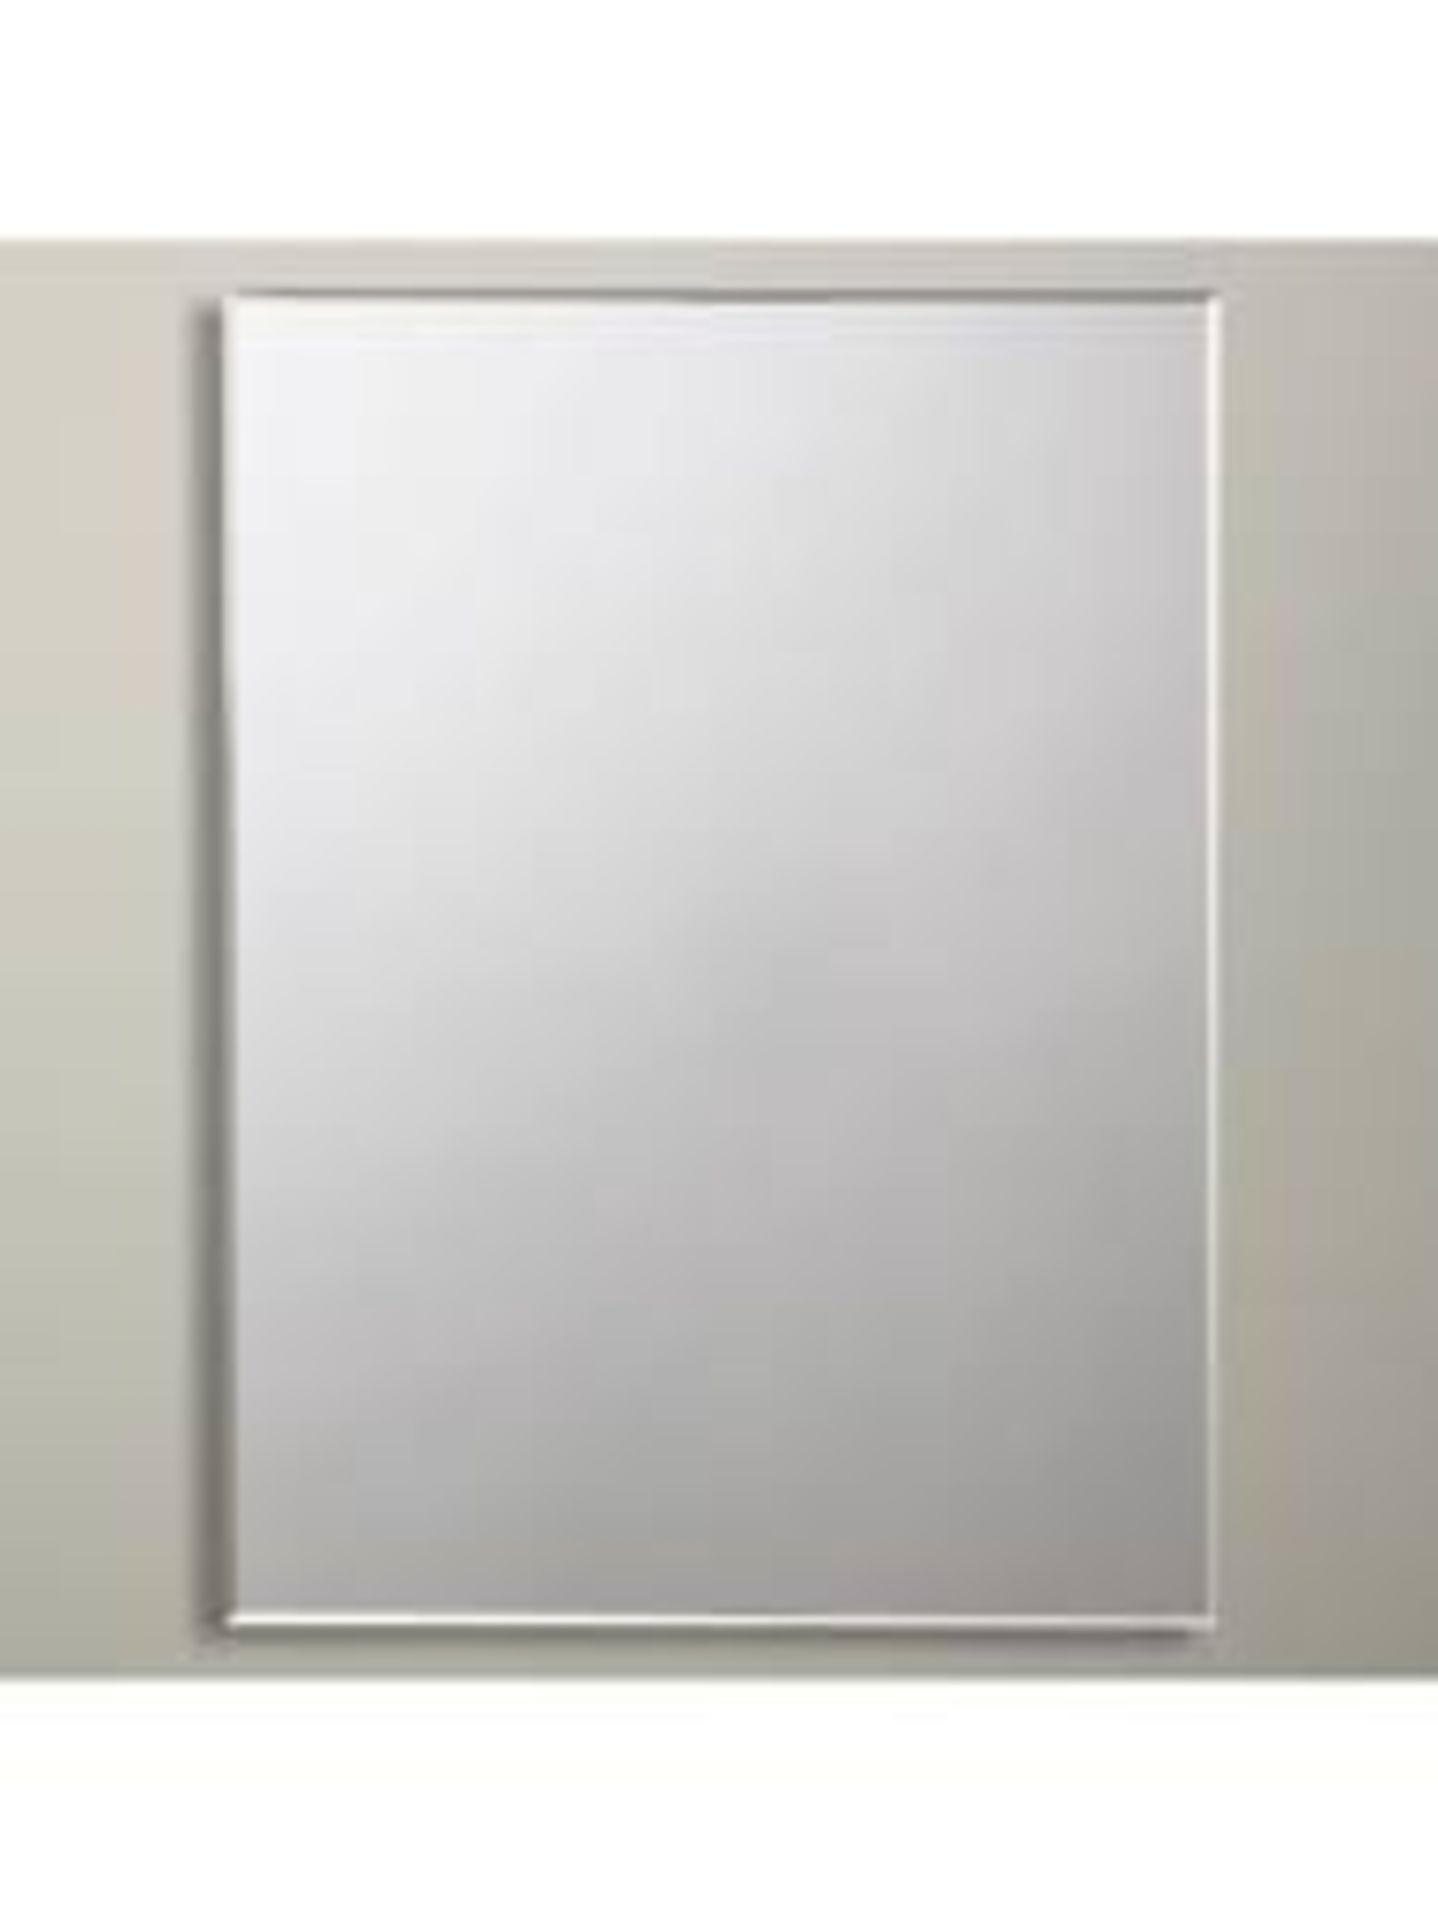 Lot 42 - Boxed John Lewis Bevelled Medium Rectangular Mirror RRP £60 (3301096) (Public Viewing and Appraisals